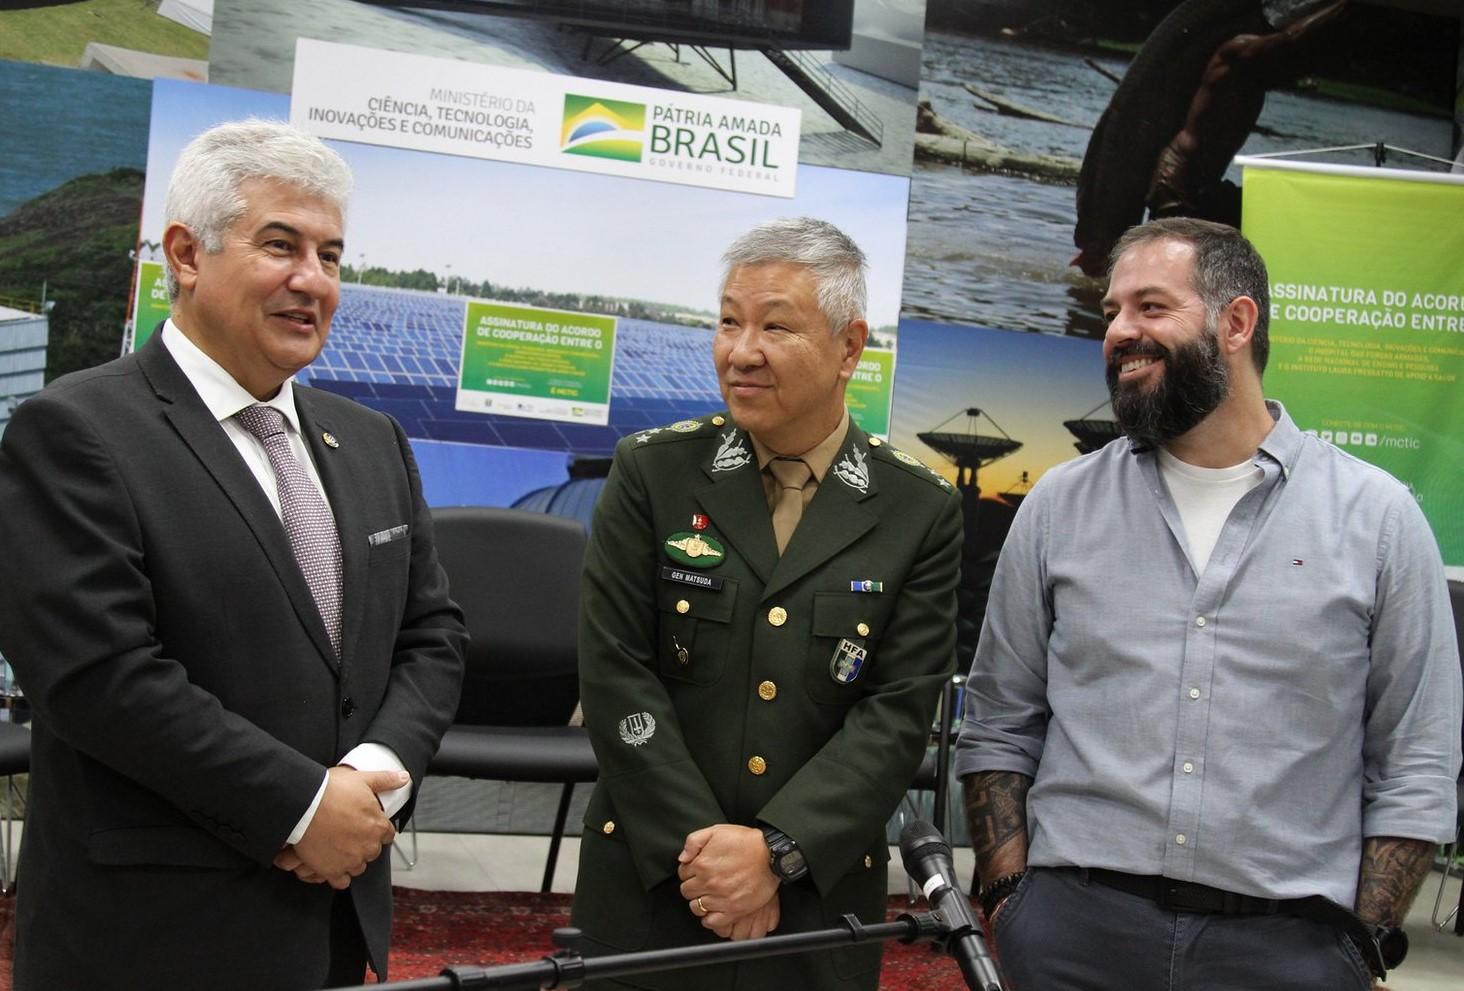 Da esquerda para direita: Ministro e Astronauta Marcos Pontes; Comandante Logístico do HFA, Rui Yutaka Matsuda; Presidente do Instituto Laura Fressatto, Jacson Fressatto.